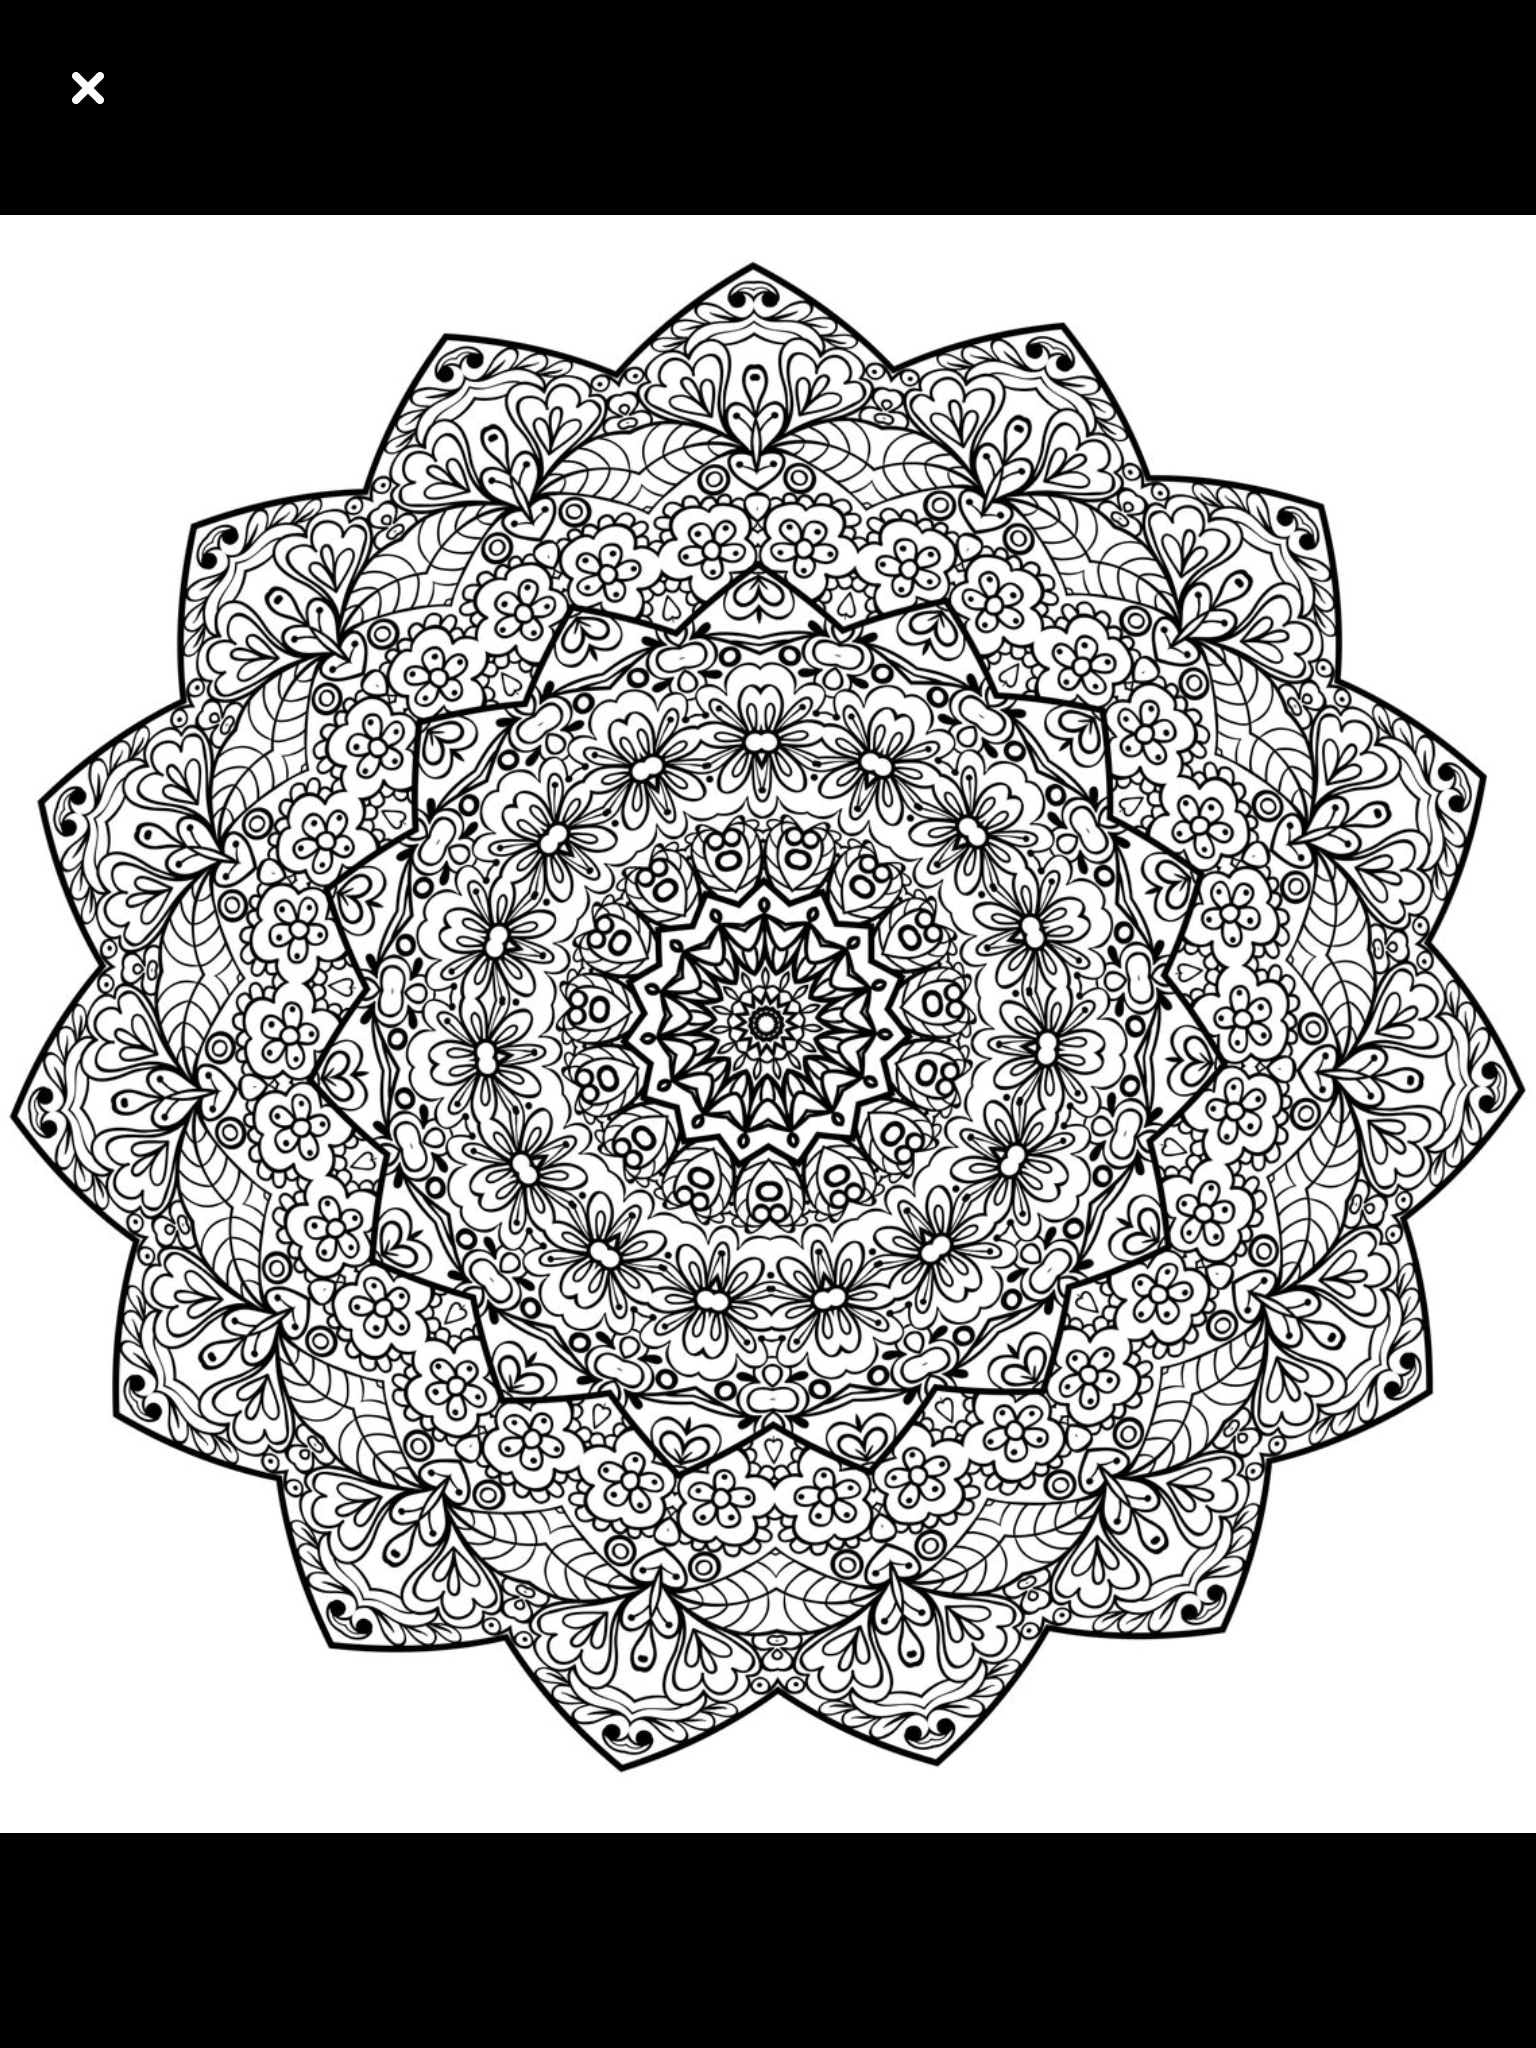 Pin By Bass Cadet On Mandalas Mandala Coloring Pages Coloring Pages Free Printable Coloring Pages